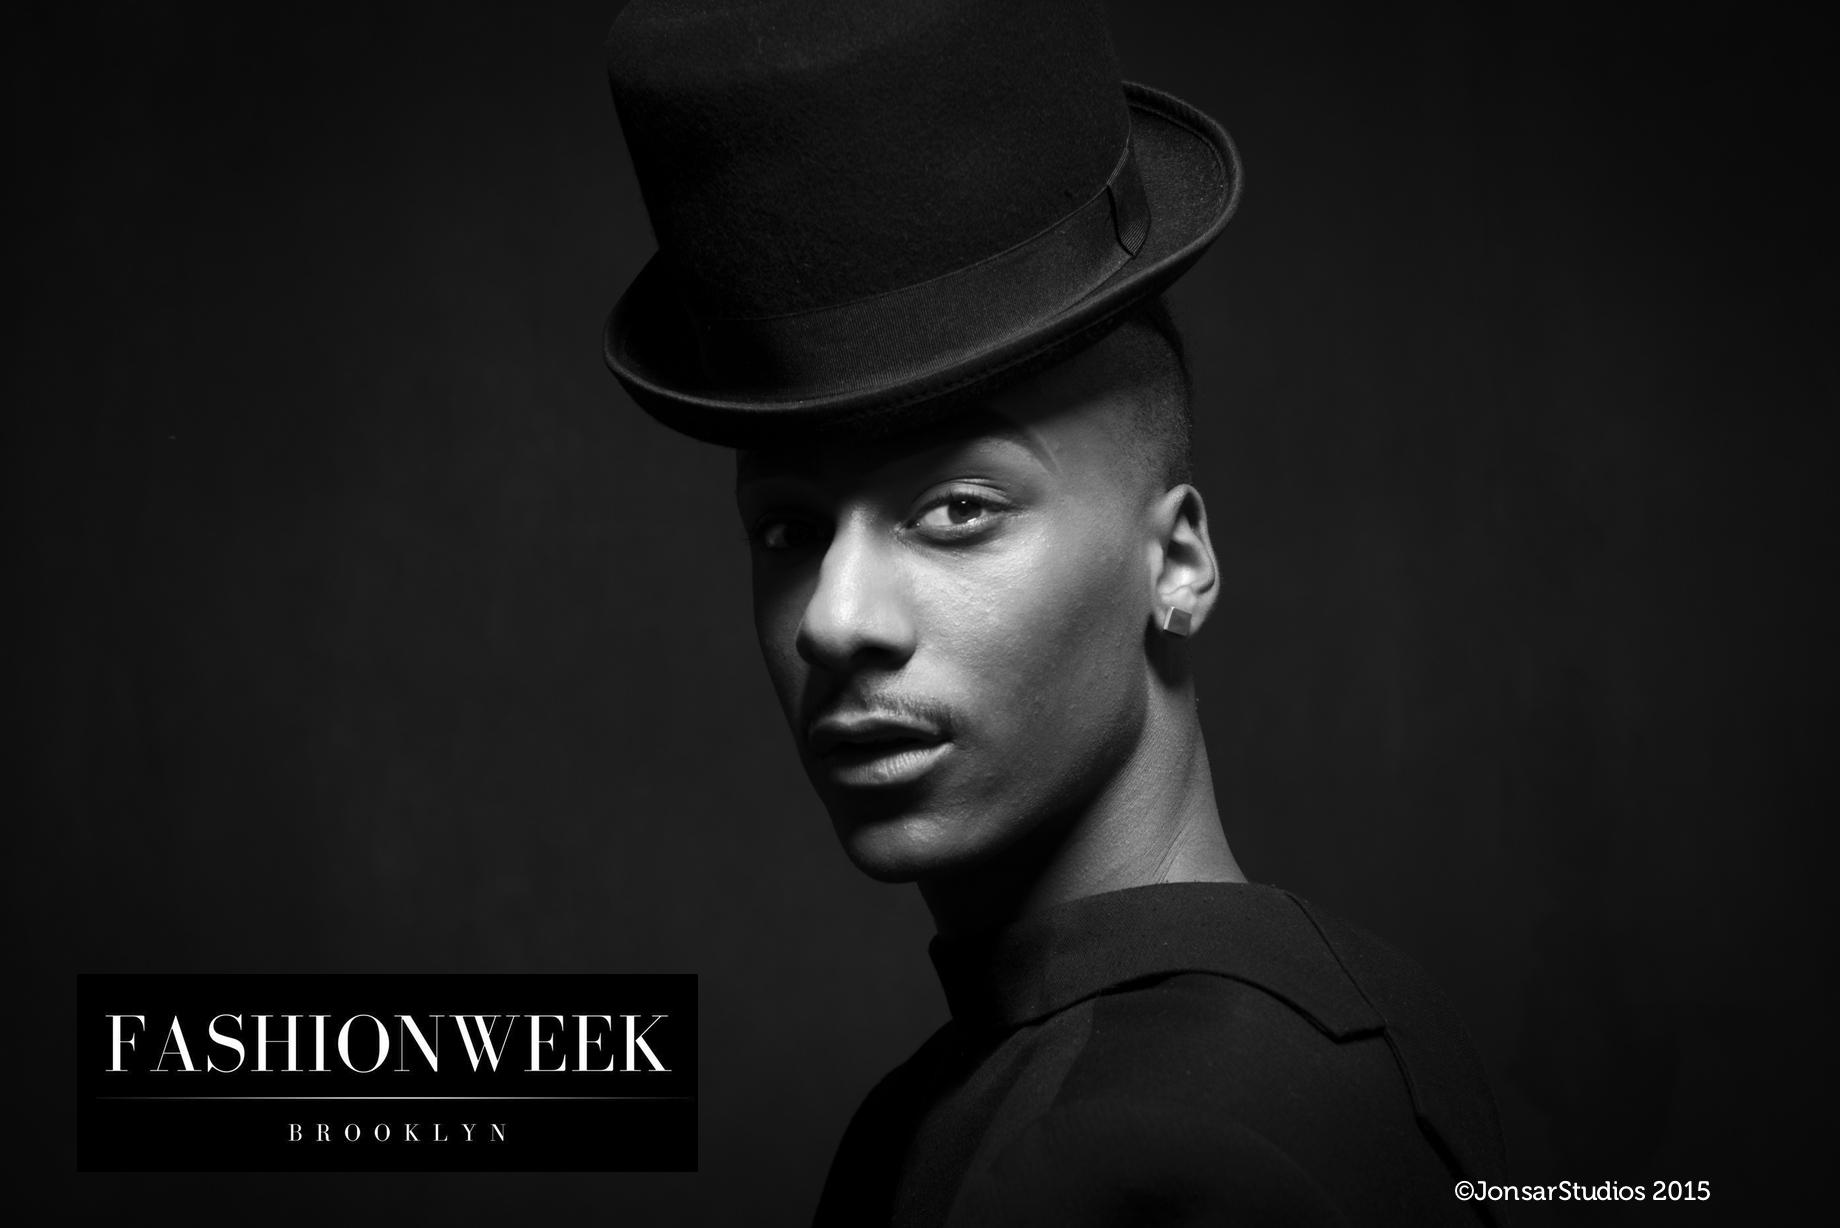 Black and White Portrait of Man on Black Background wearing Black Hat